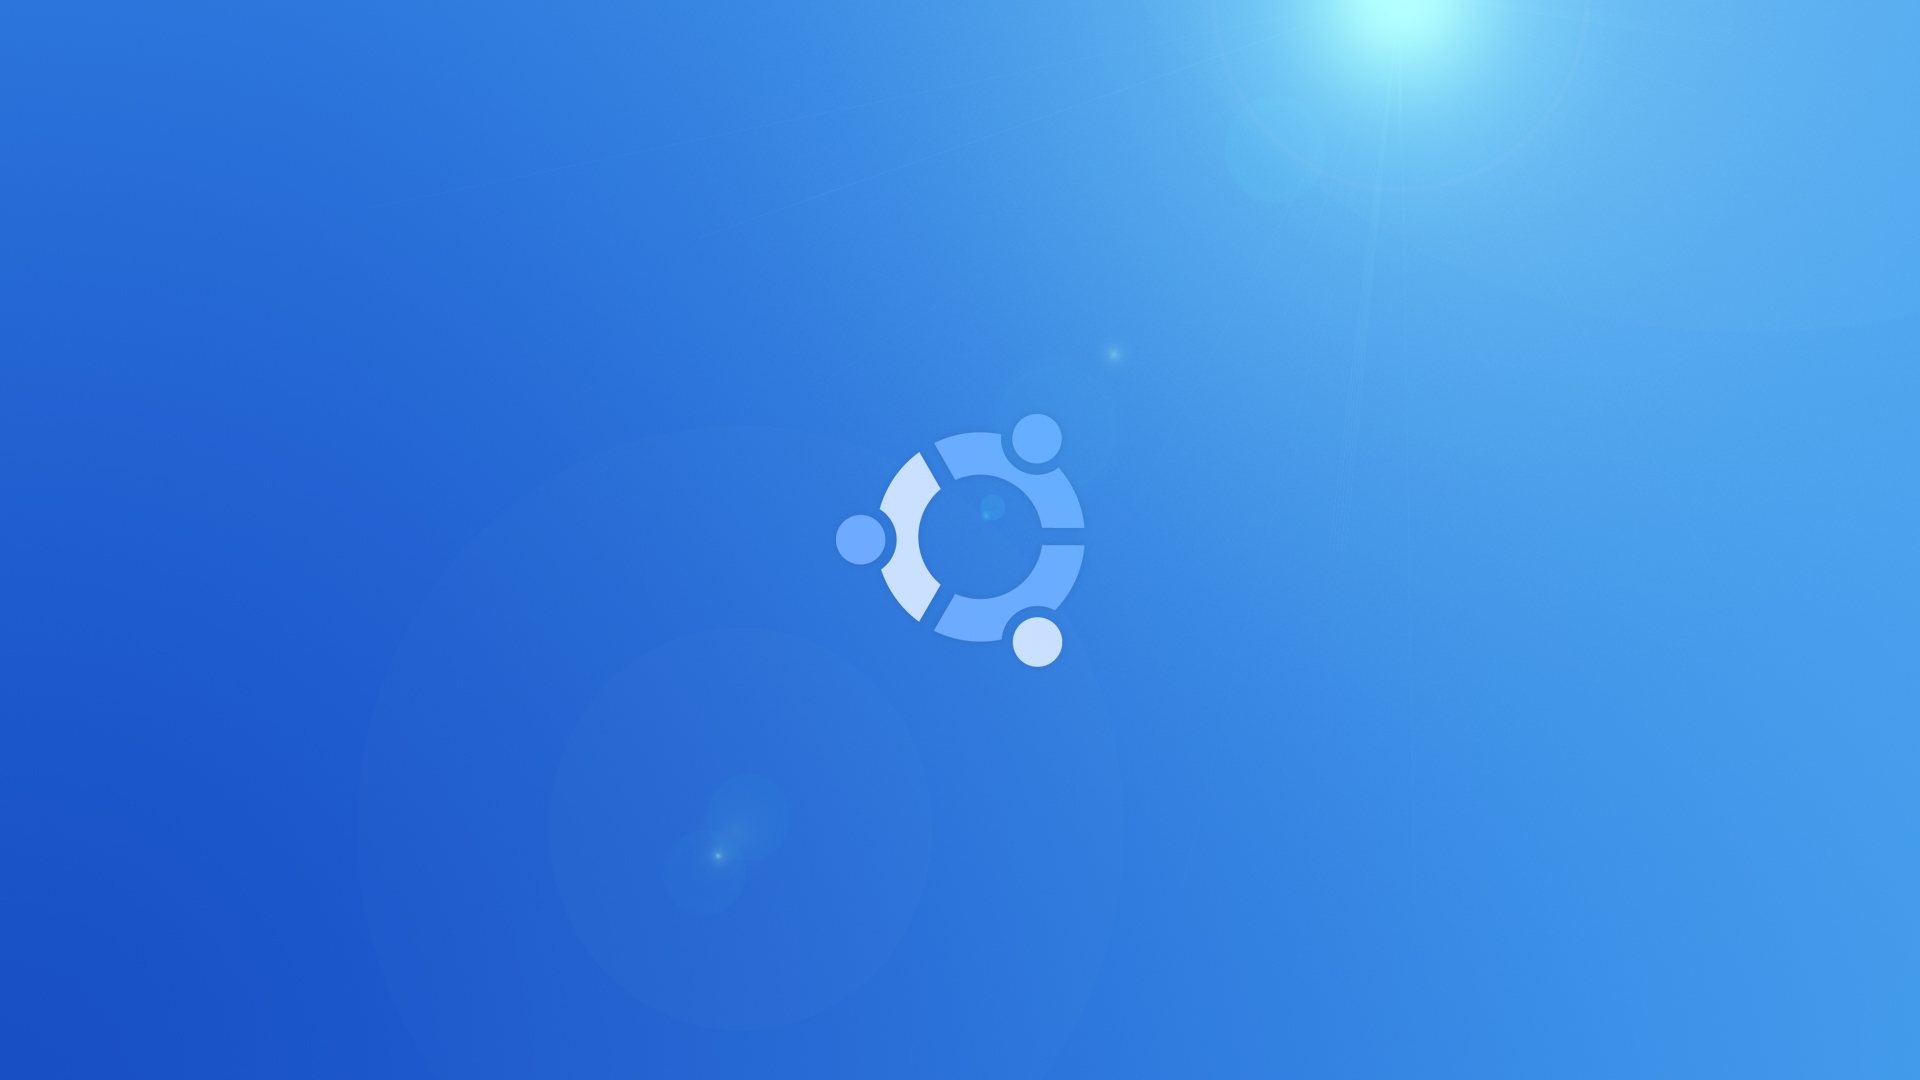 ubuntu wallpaper linux 1920x1080 1920x1080